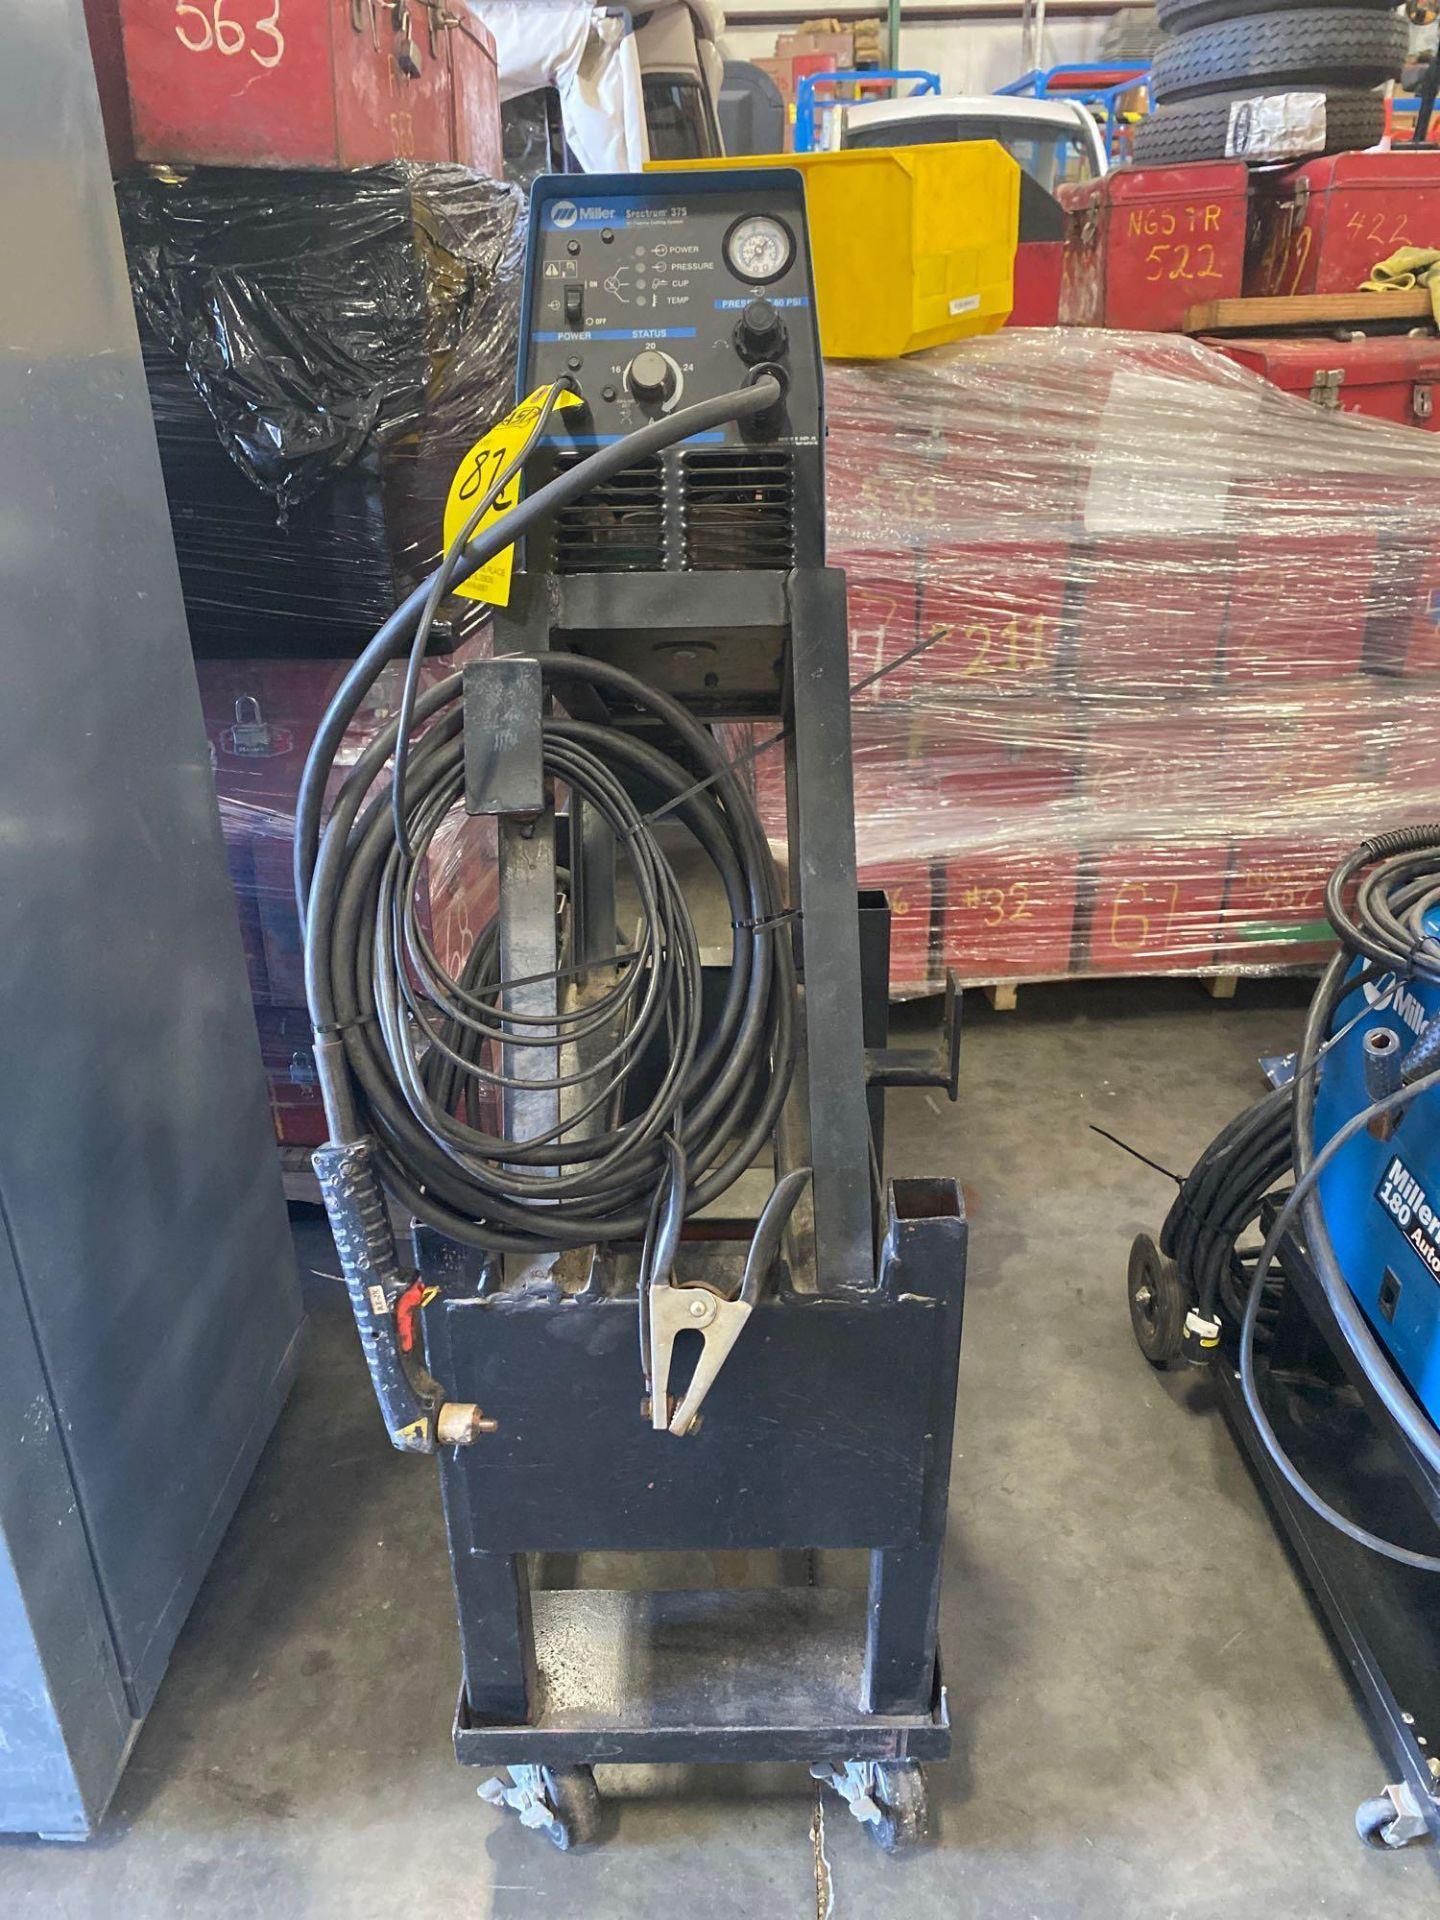 Lot 87C - MILLER SPECTRUM 375 DC PLASMA CUTTING SYSTEM WELDER